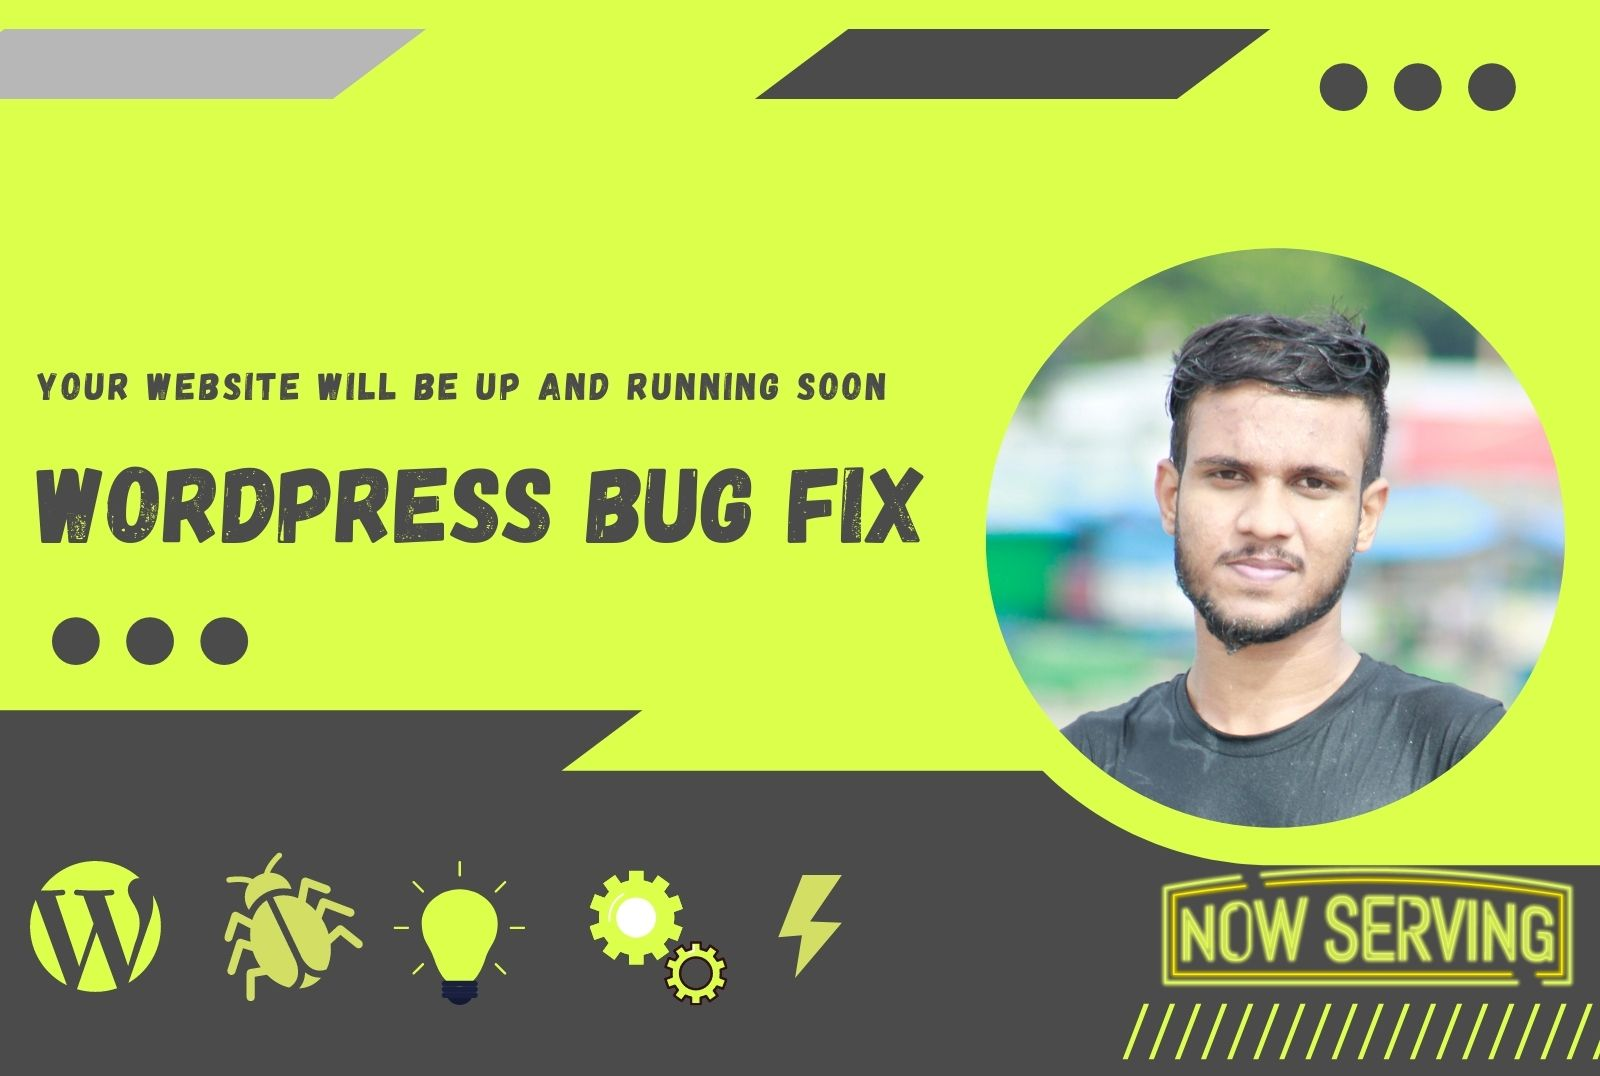 I will fix or debug WordPress website bug issues errors